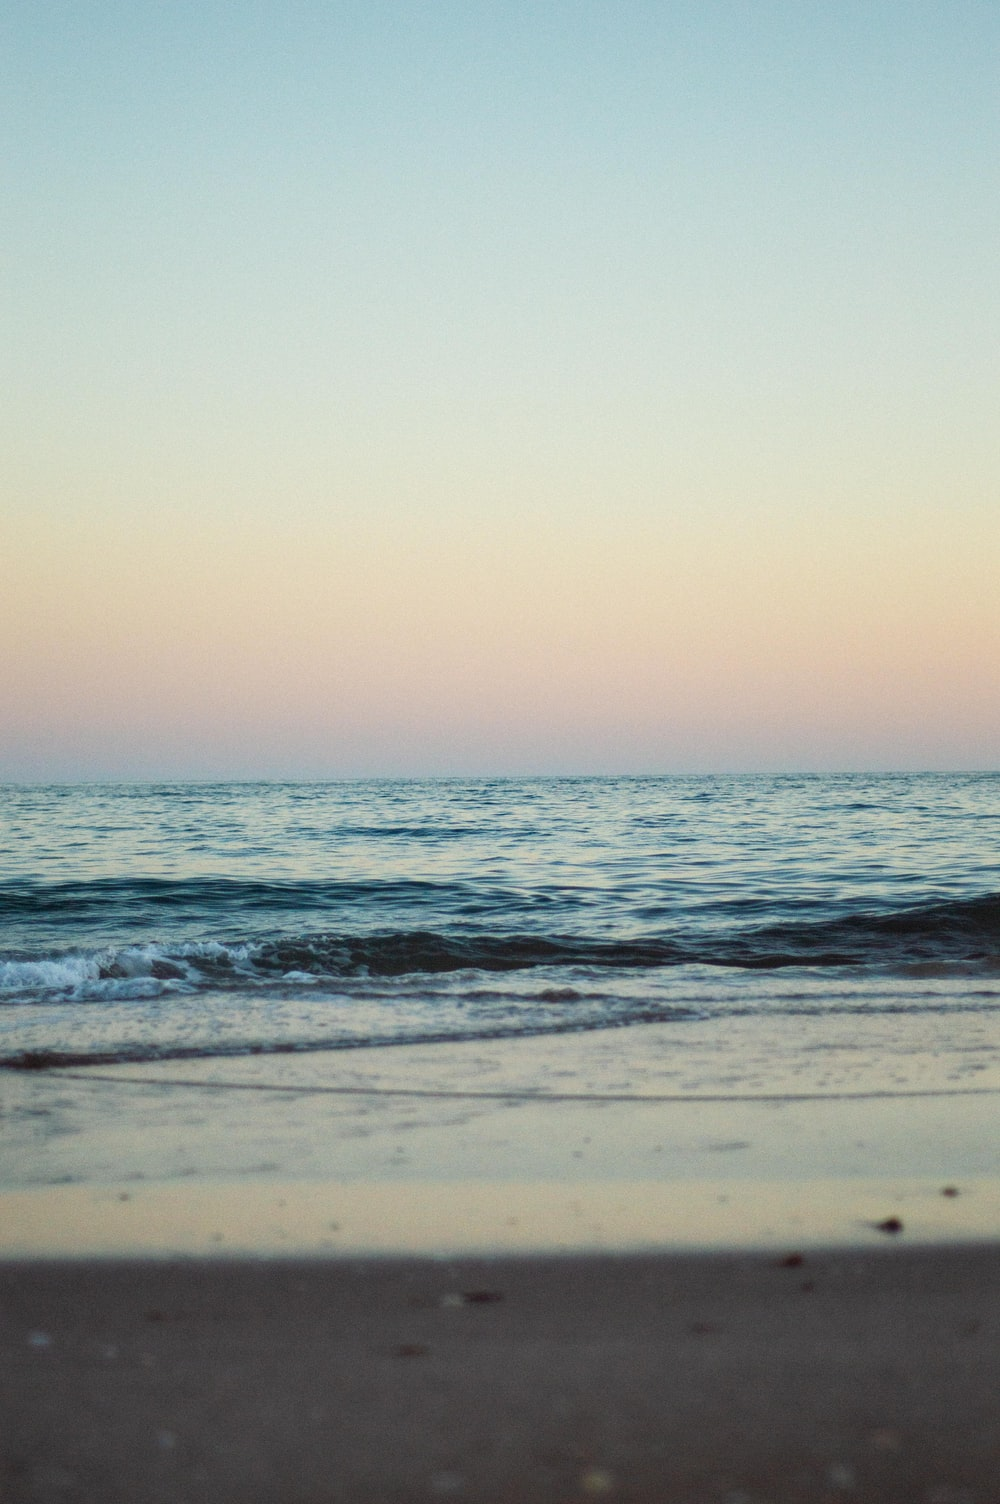 seashore beside body of water